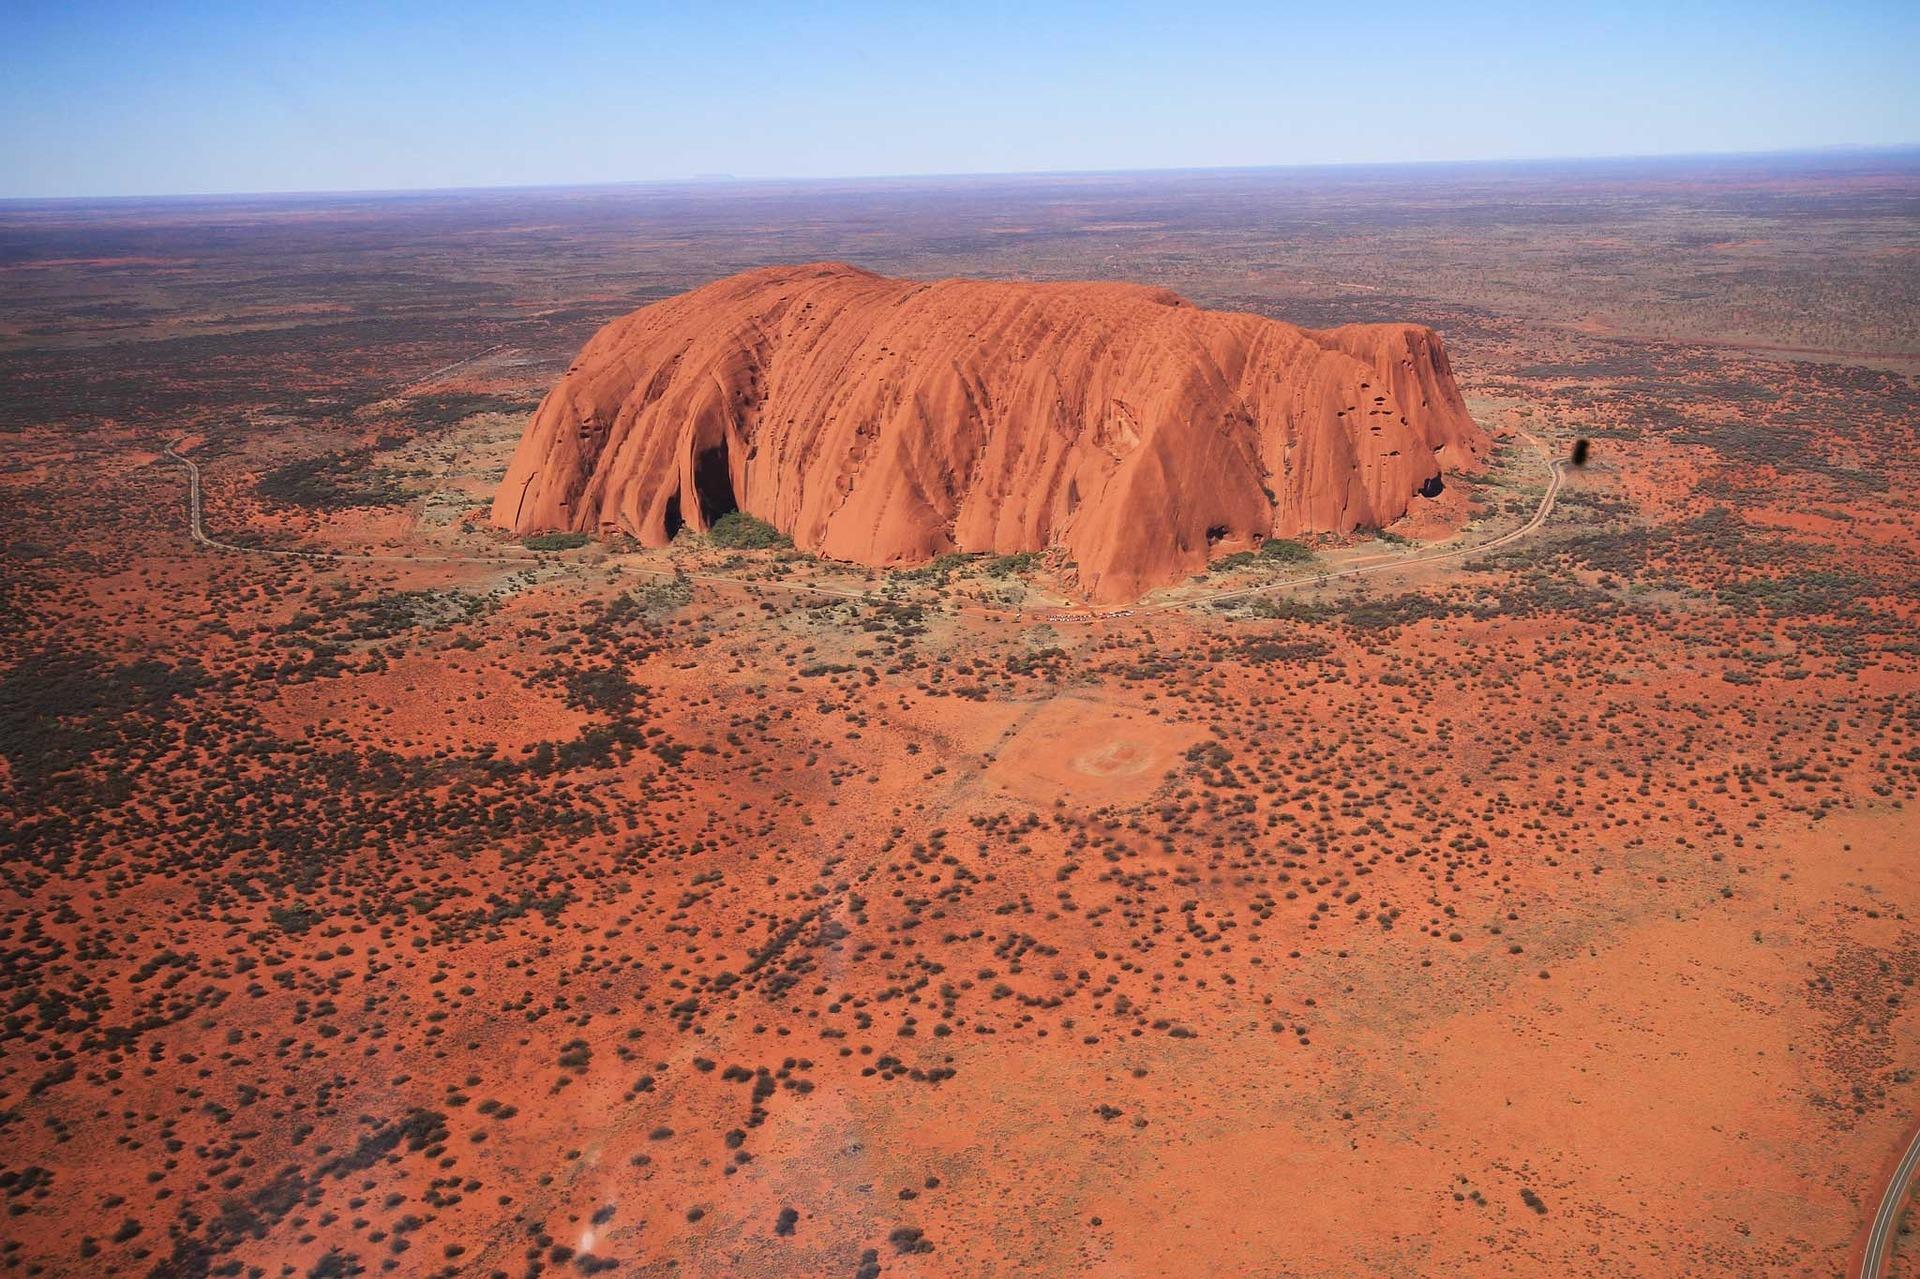 Birds-eye view of Uluru